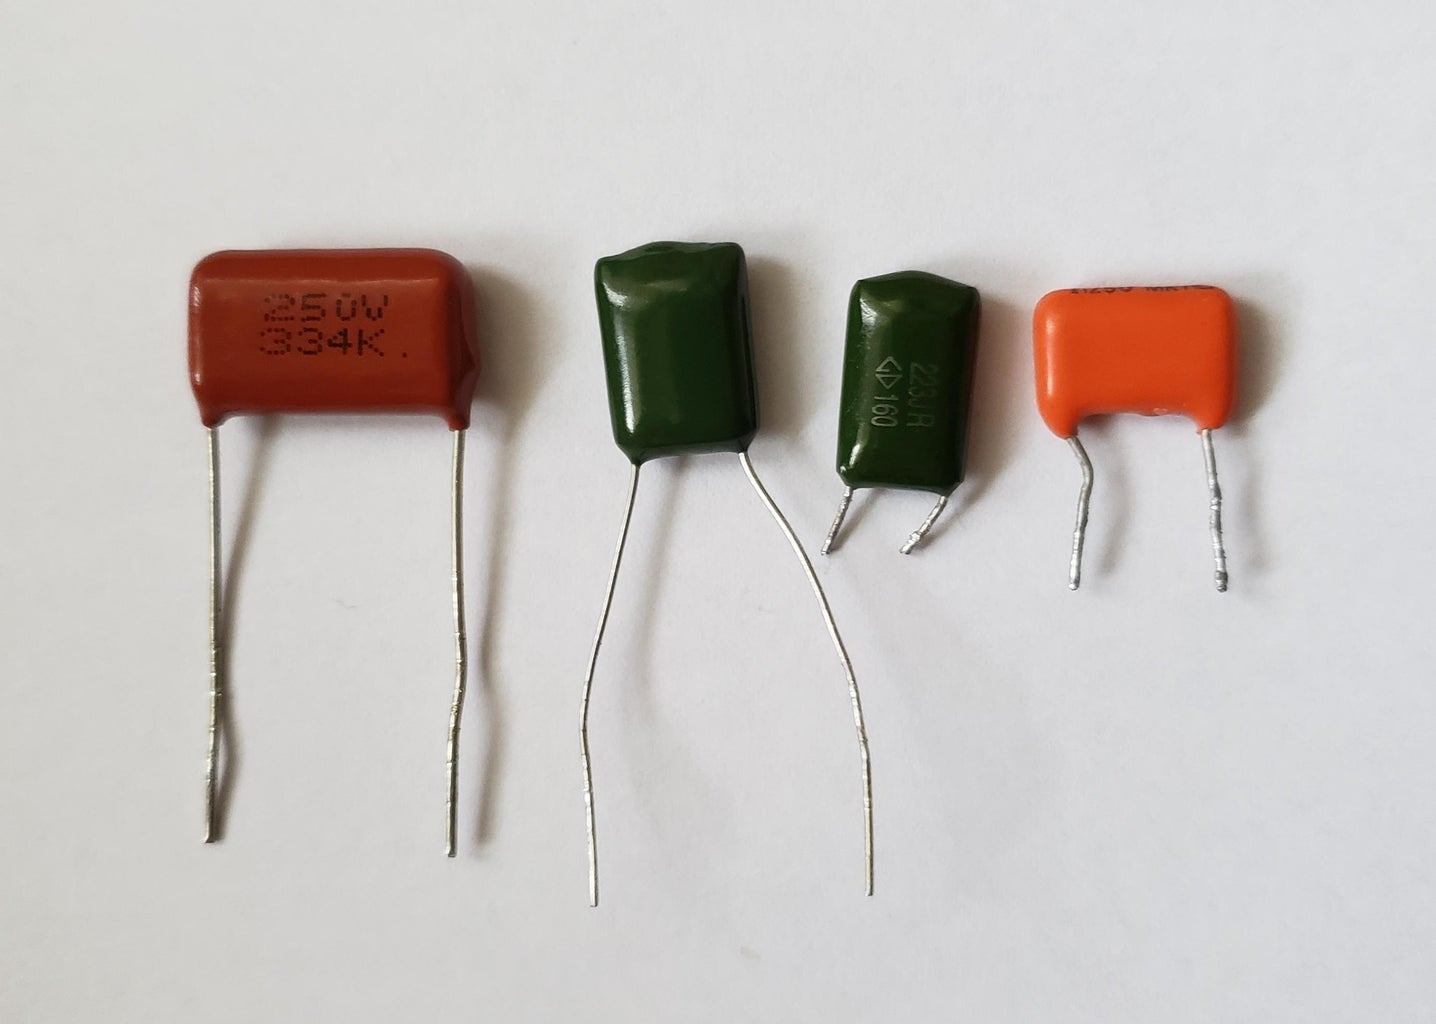 Modern Plastic, Mylar or Film Capacitors.